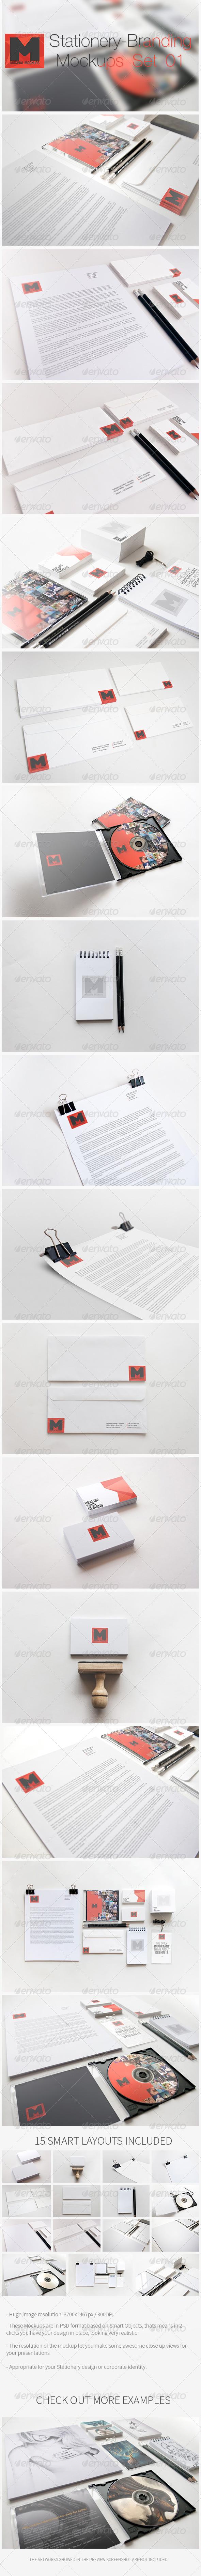 Stationery - Branding Mockups - Set 01